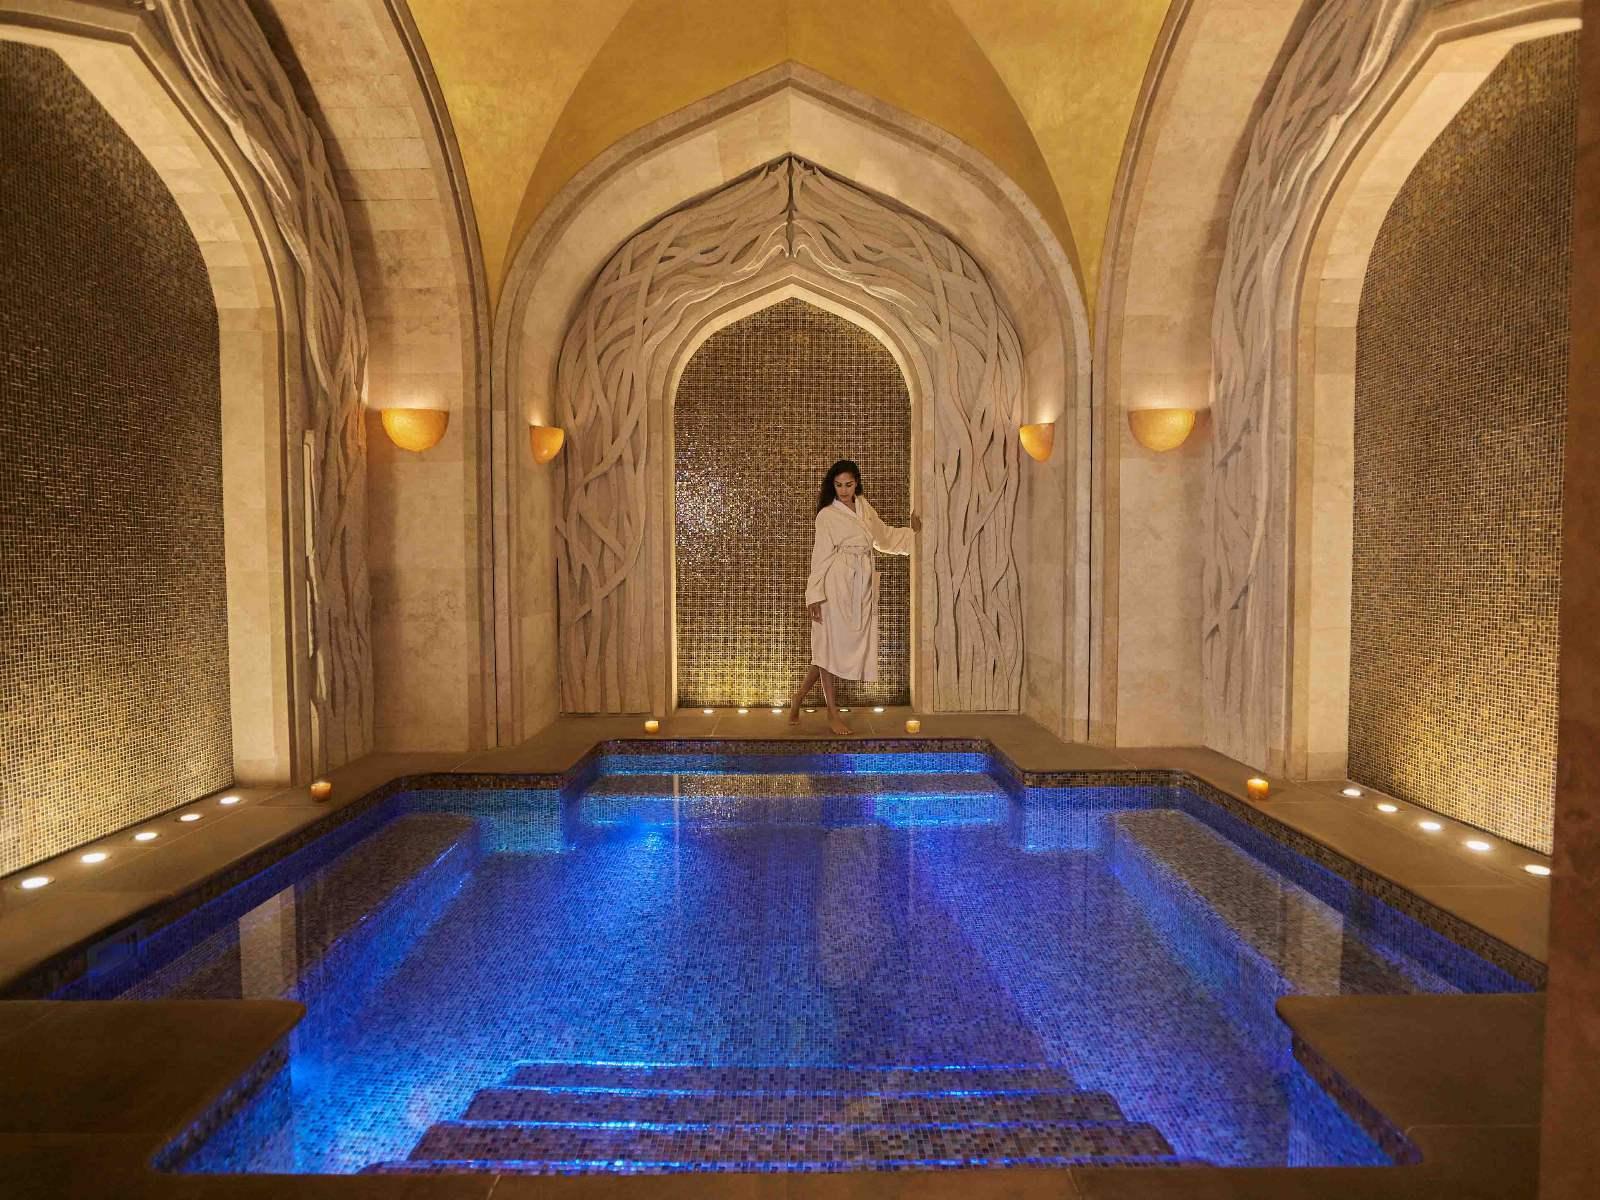 Atlantis, The Palm - ShuiQi Spa